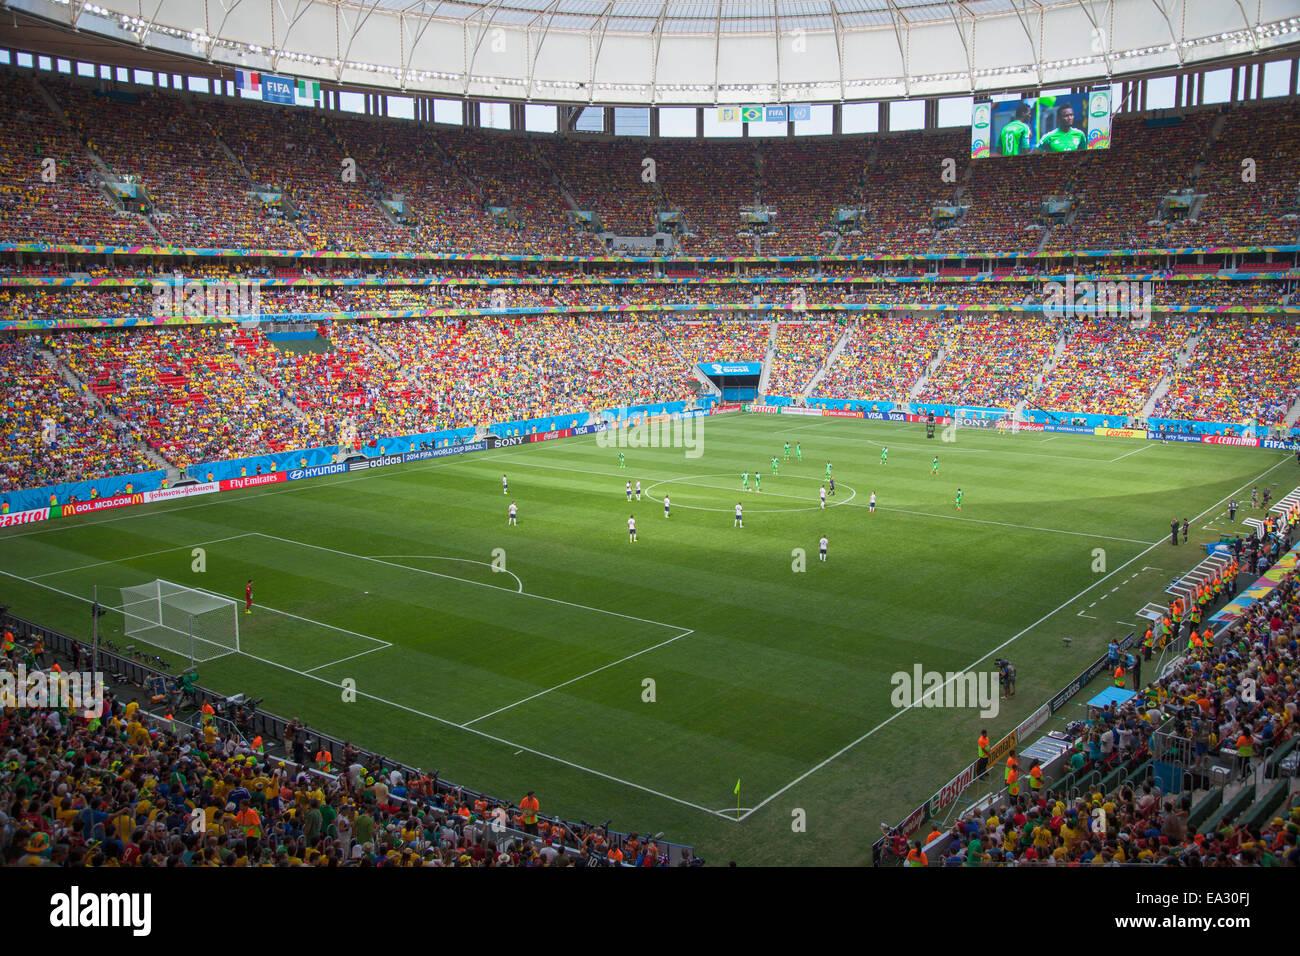 World Cup football match in National Mane Garrincha Stadium Stock